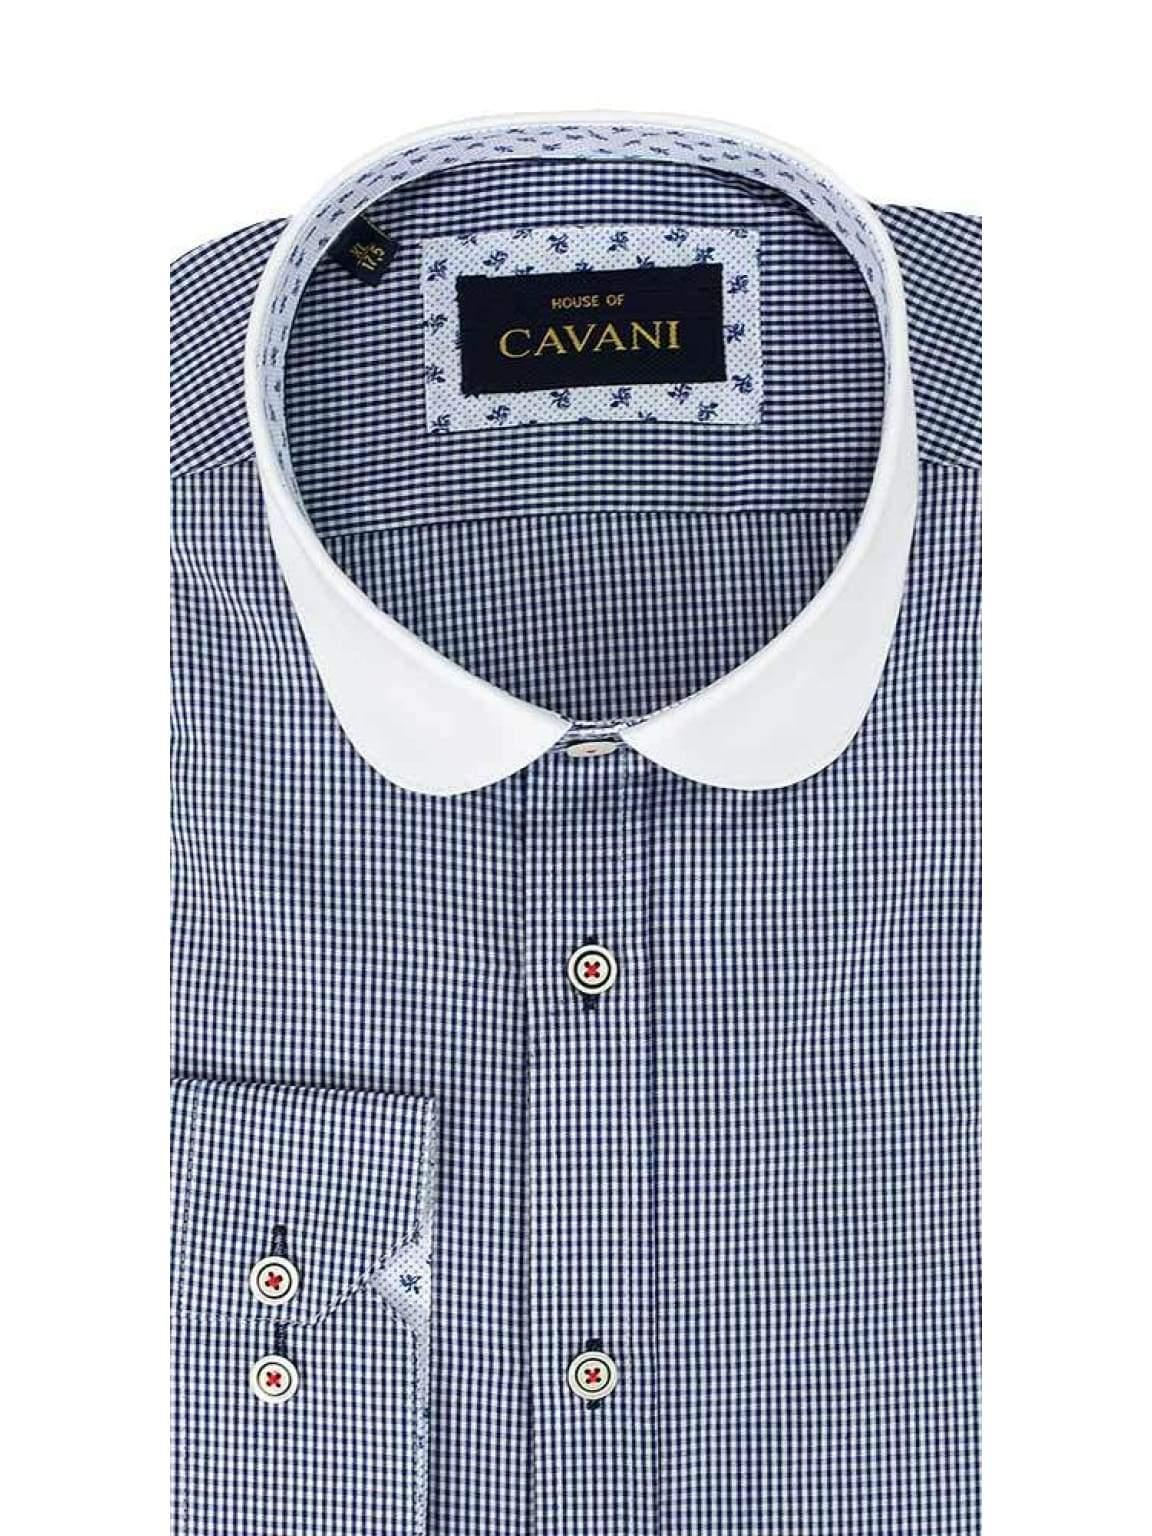 Cavani Penny Collar Navy Gingham Check Shirt - UK 14.5   EU 37 - Shirts